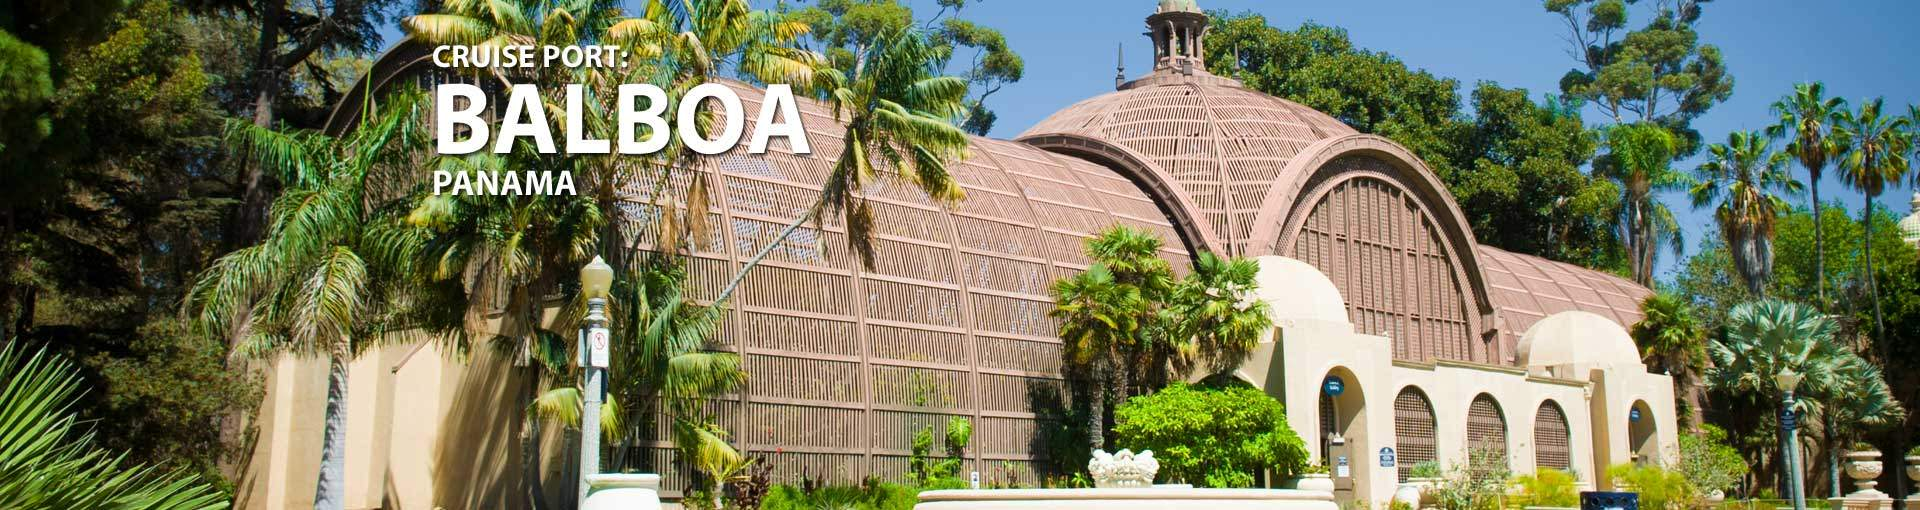 Cruises to Balboa, Panama